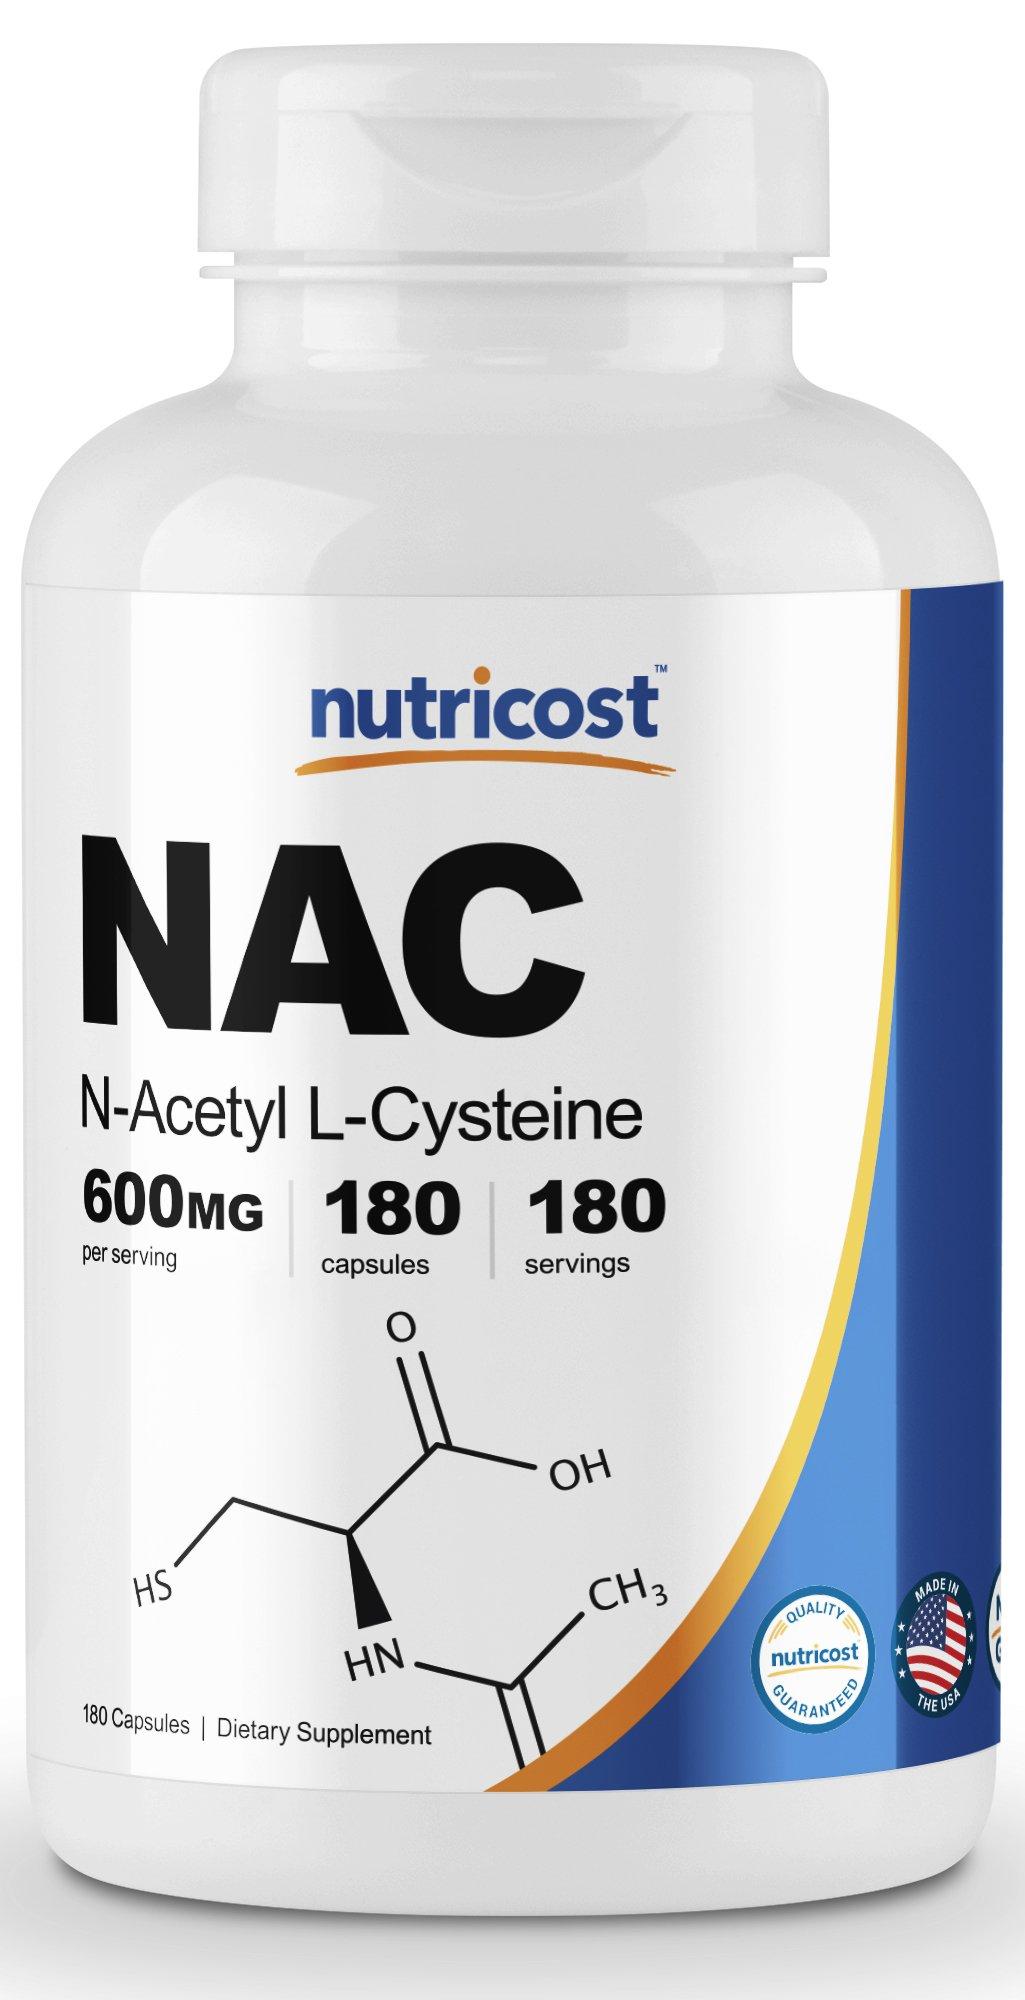 Nutricost N-Acetyl L-Cysteine (NAC) 600mg; 180 Capsules